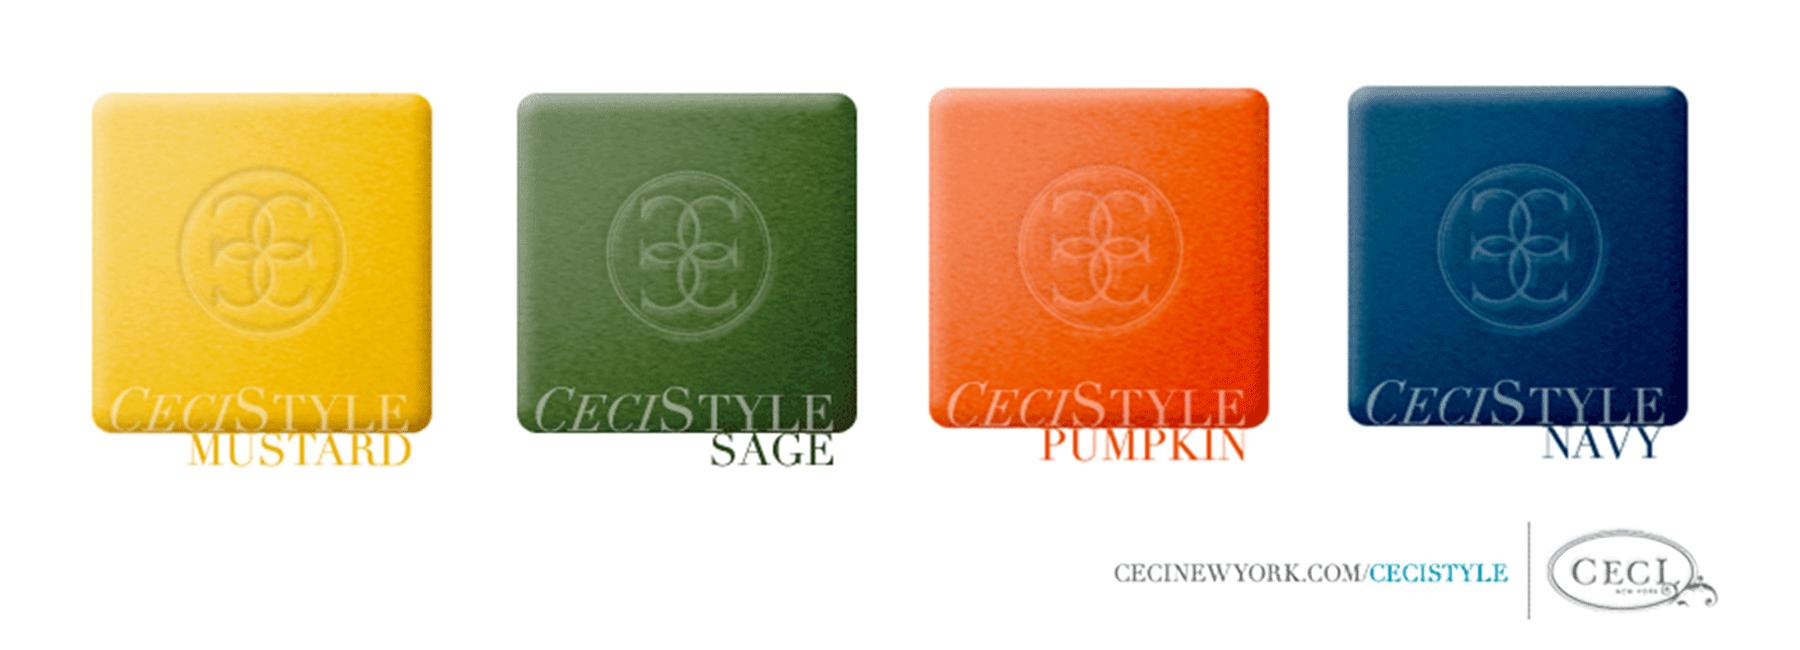 Ceci's Color Stories - Mustard & Sage Wedding Color Swatches - color swatches, mustard, sage, pumpkin, navy, ceci new york, ceci style, ceci johnson, color stories, inspiration